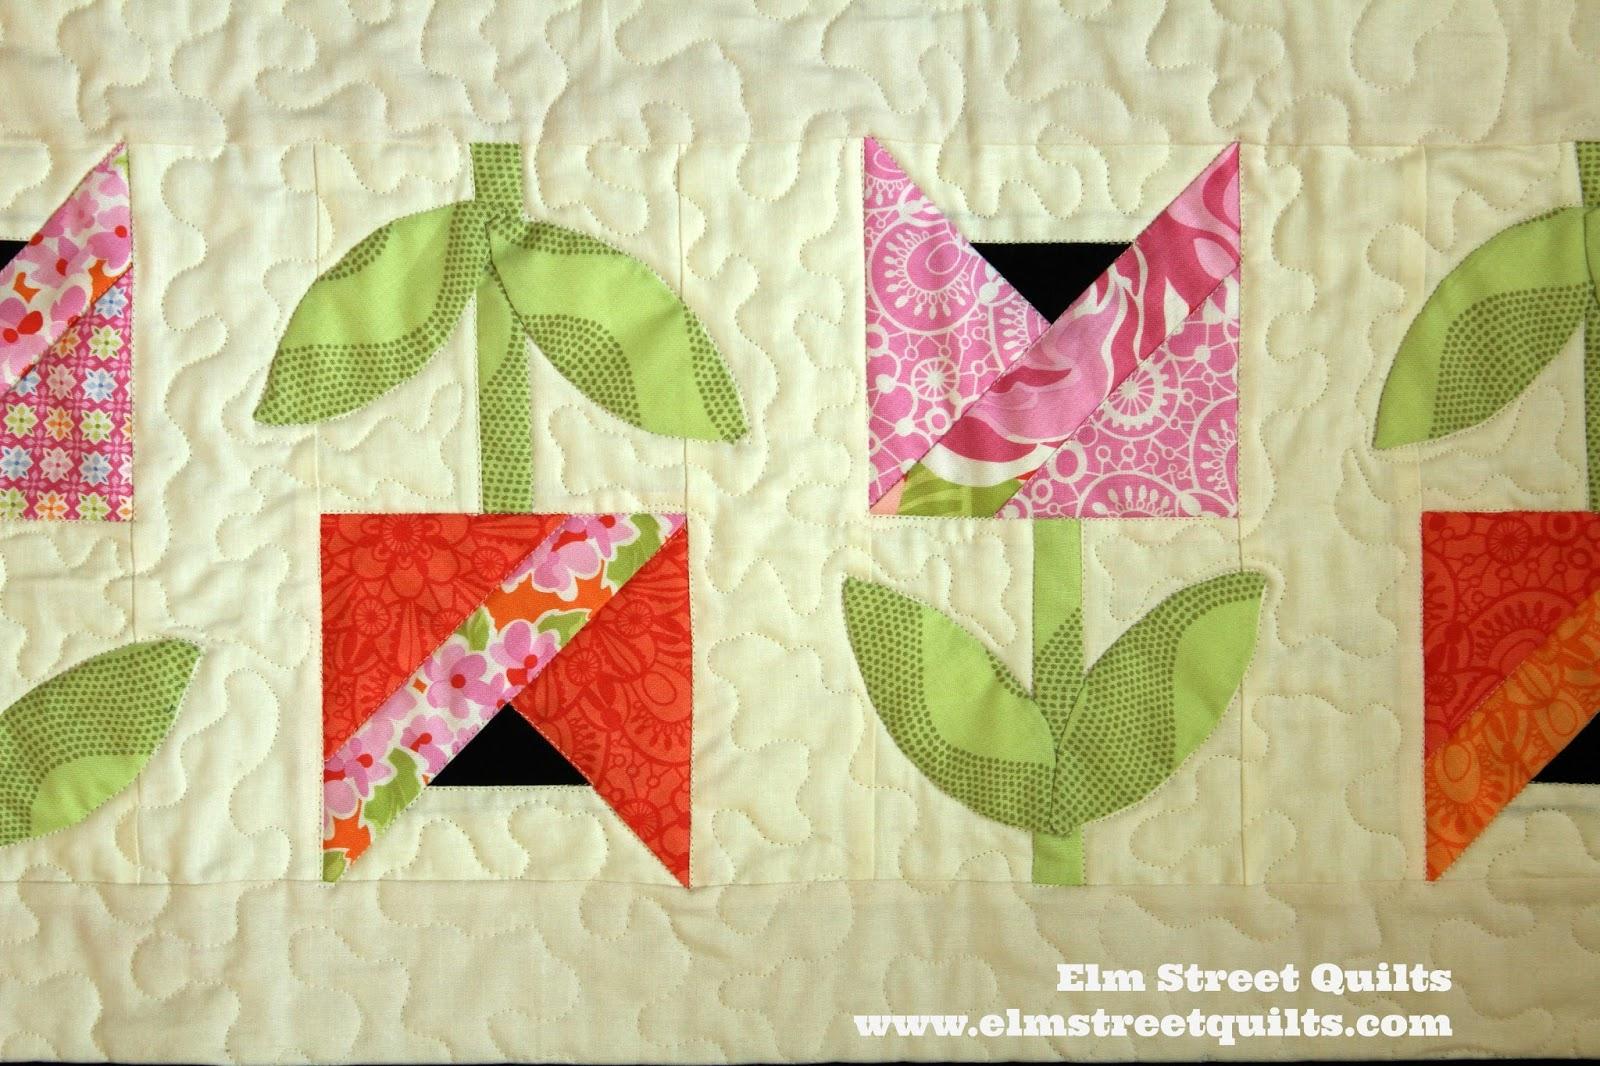 Tulips | Elm Street Quilts : tulip quilts - Adamdwight.com